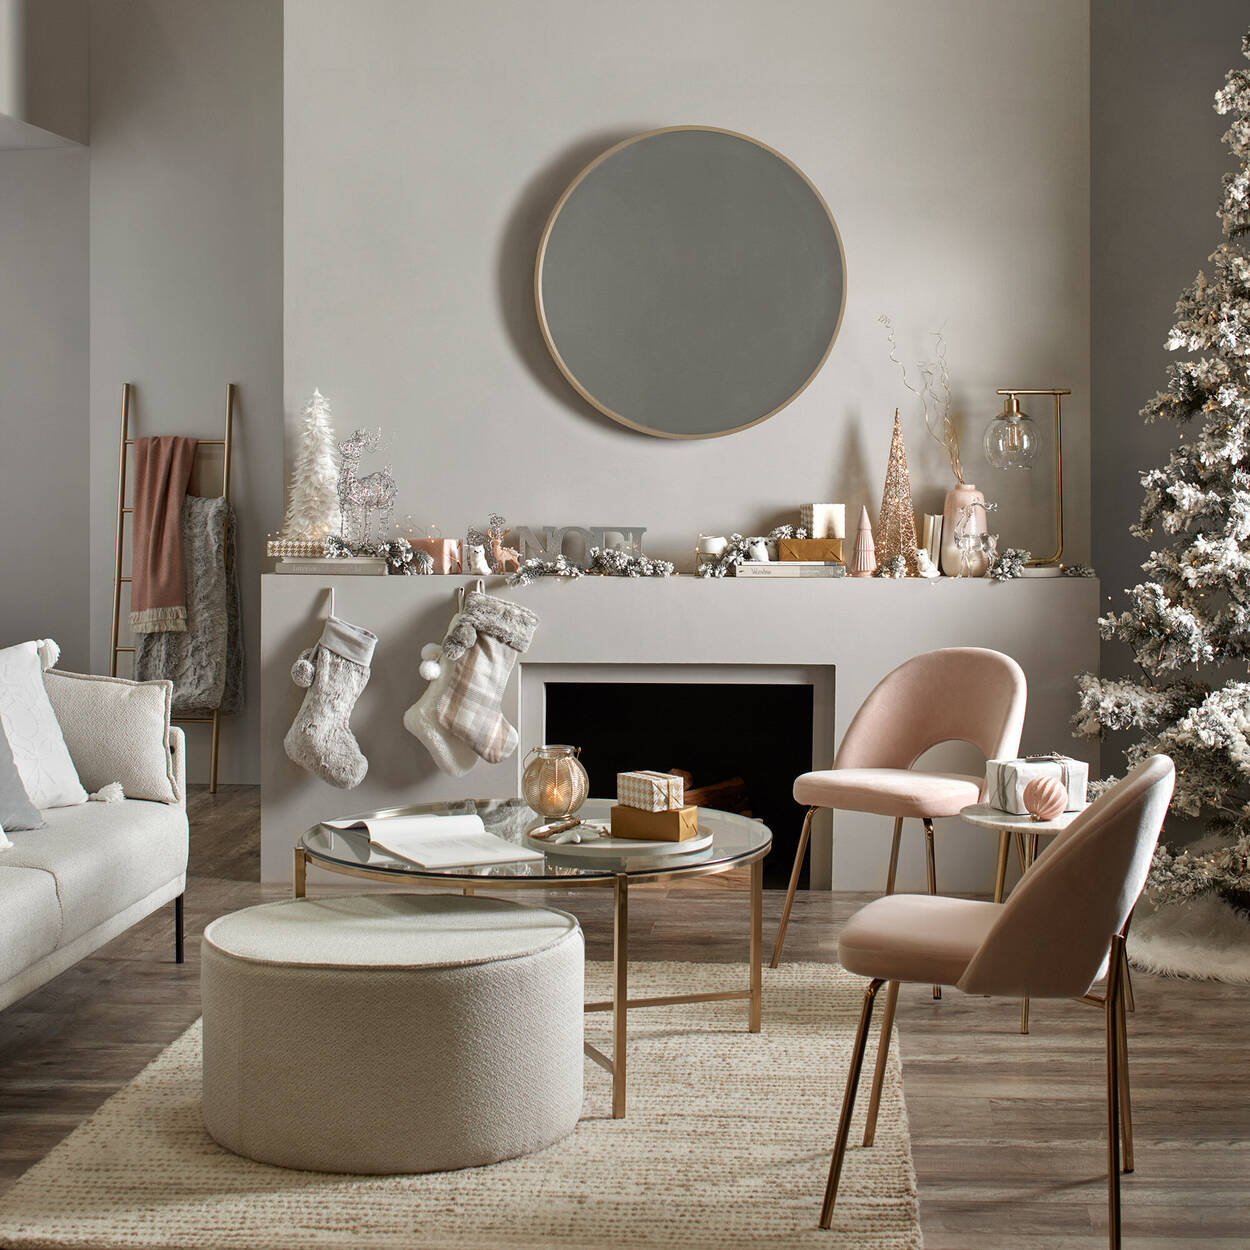 Decorative Pink Tree